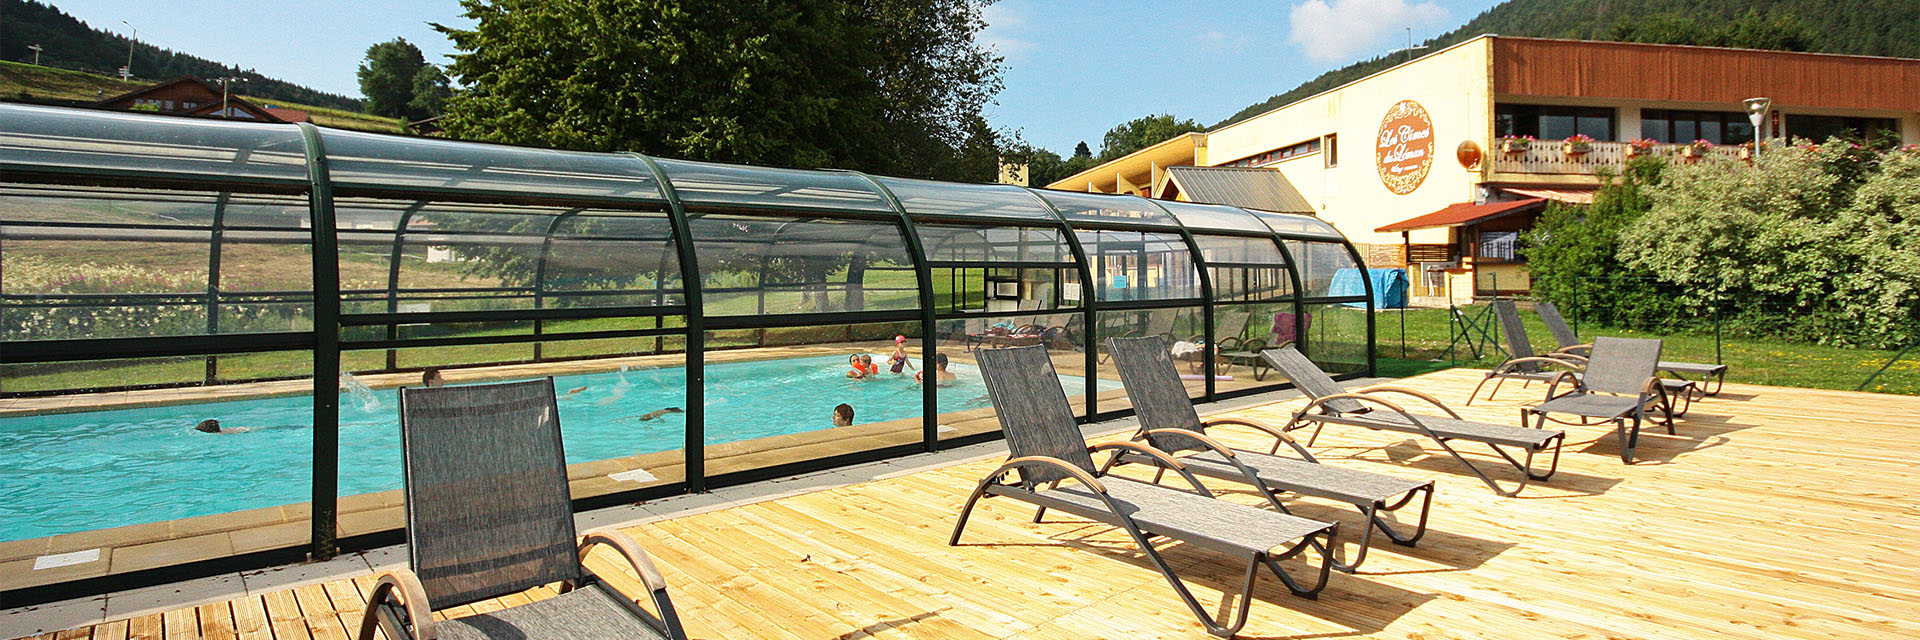 Village_club_vacances_haute-savoie_leman-piscine